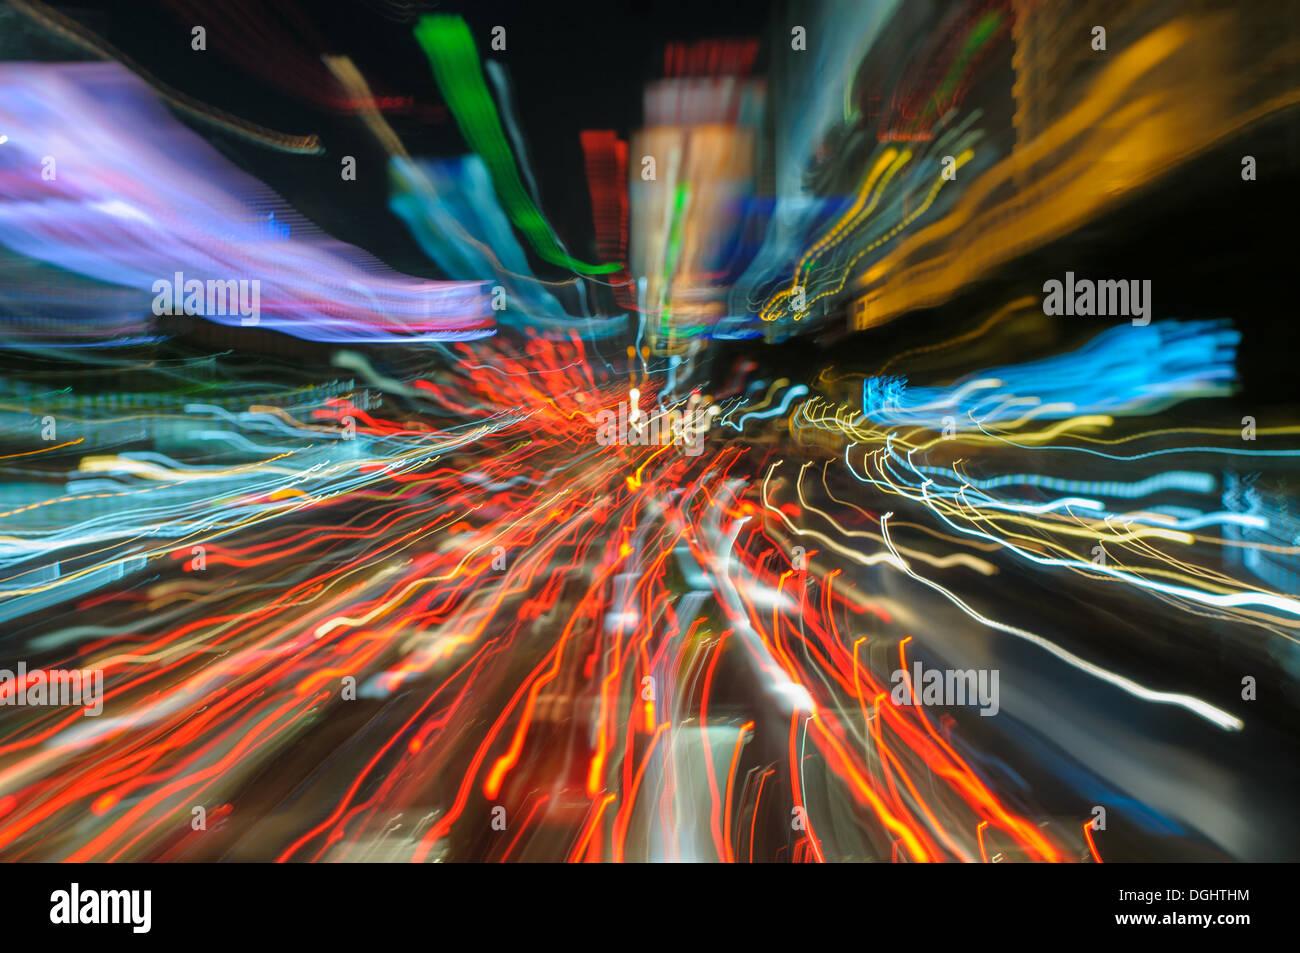 traffic lights in motion blur - Stock Image